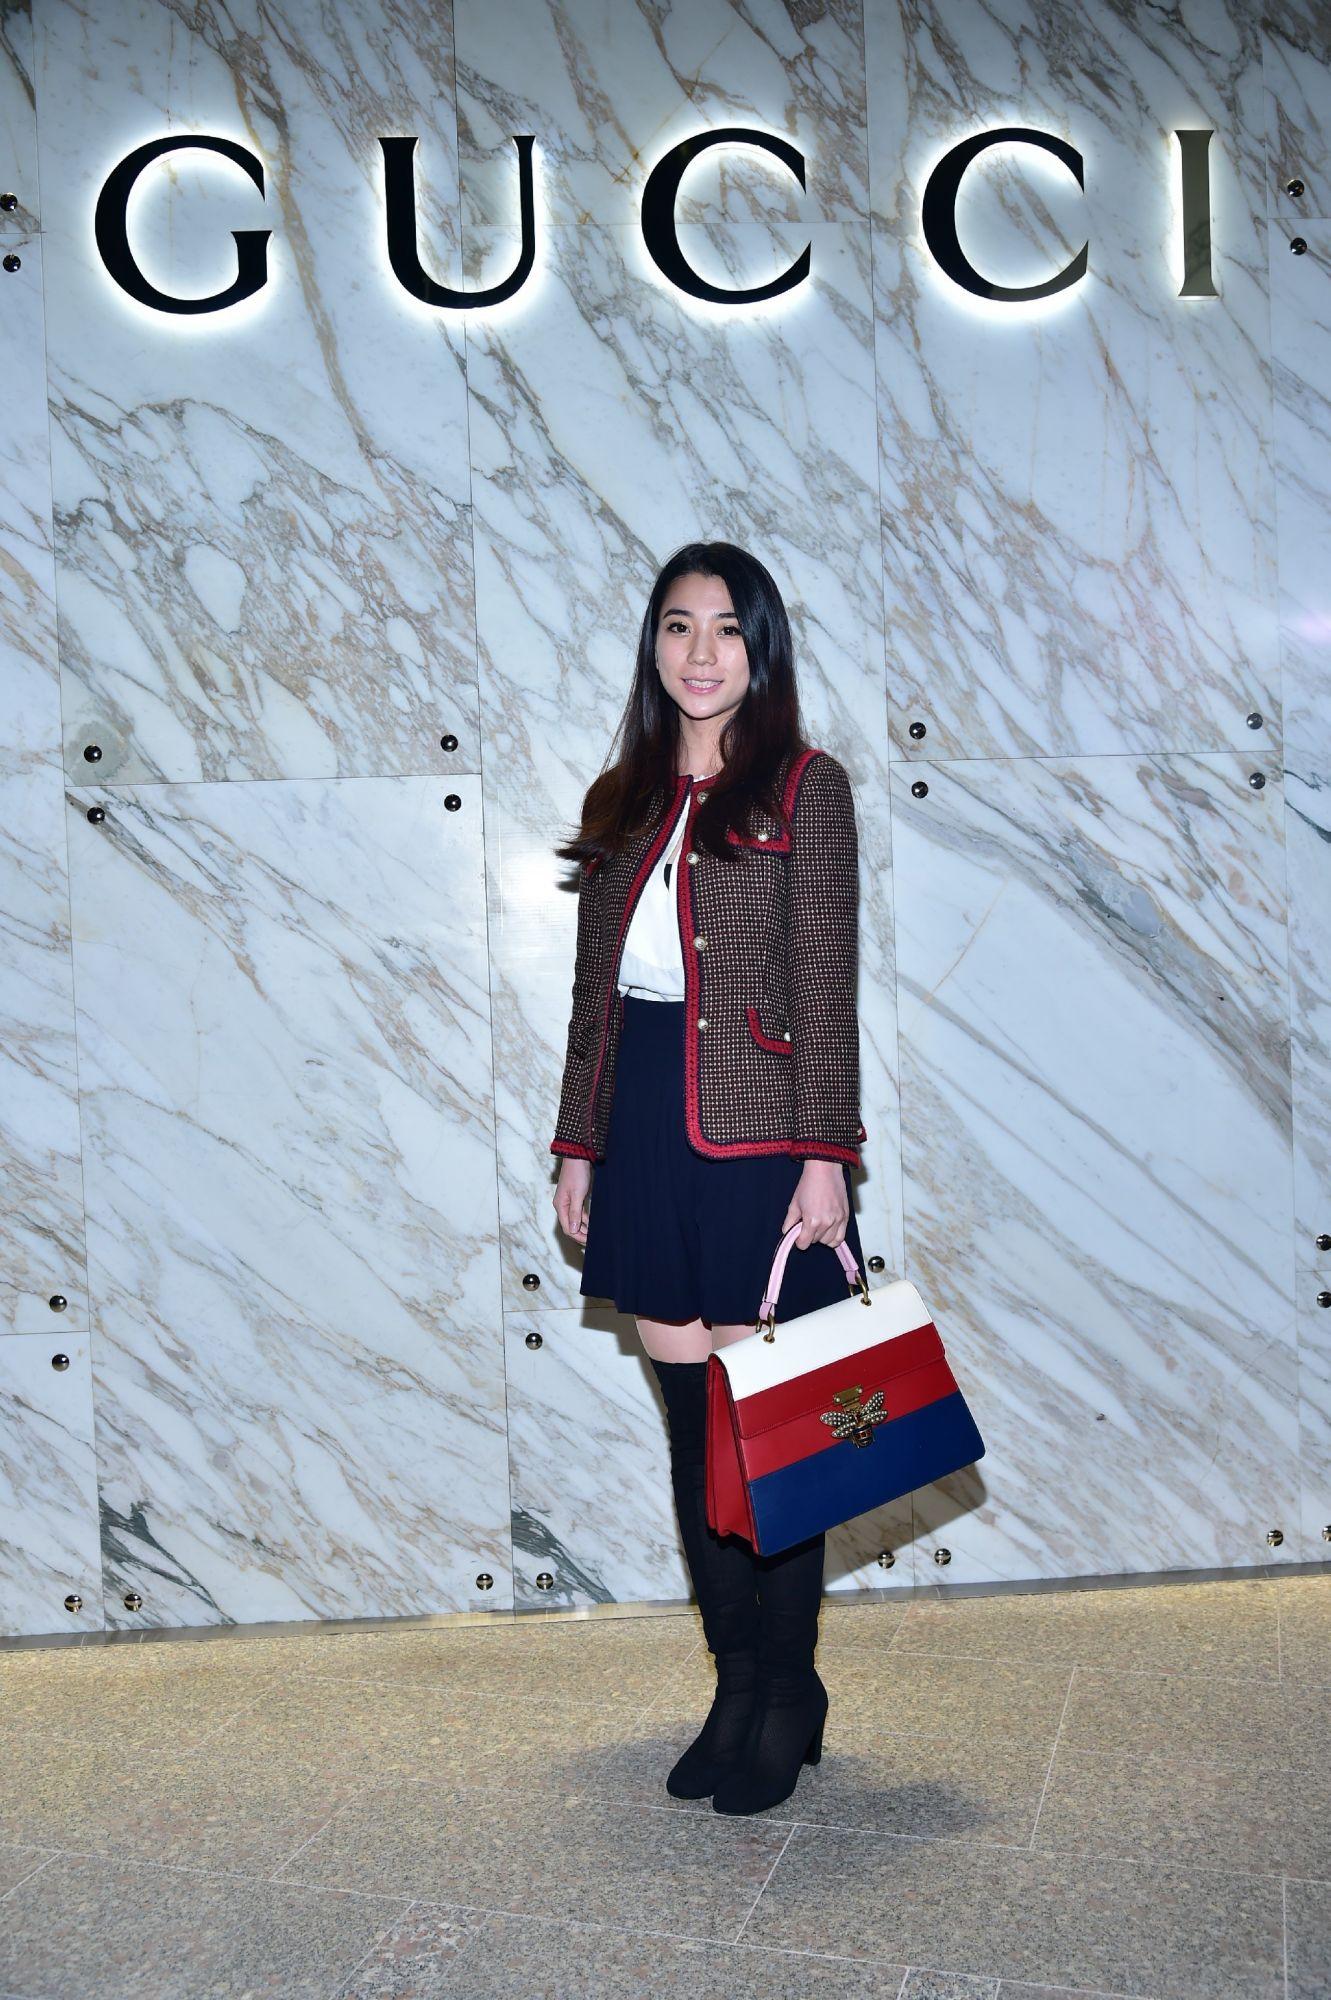 Vincy Yeung